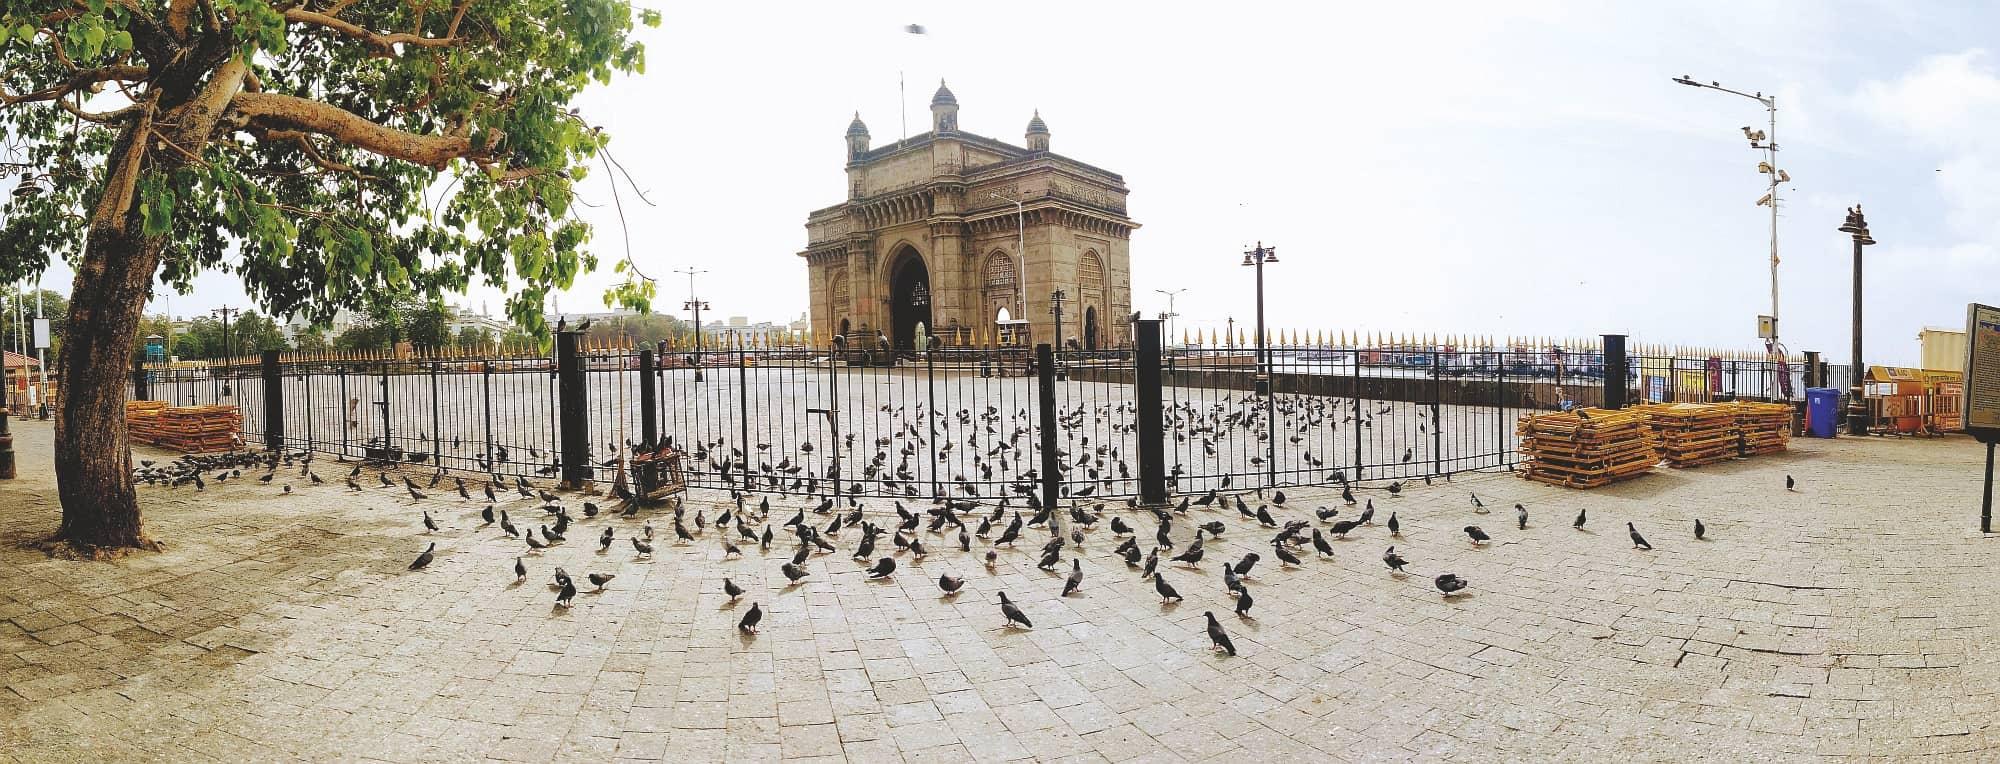 Mumbai Lockdown Pollution Levels Dip, Fauna Gets Space